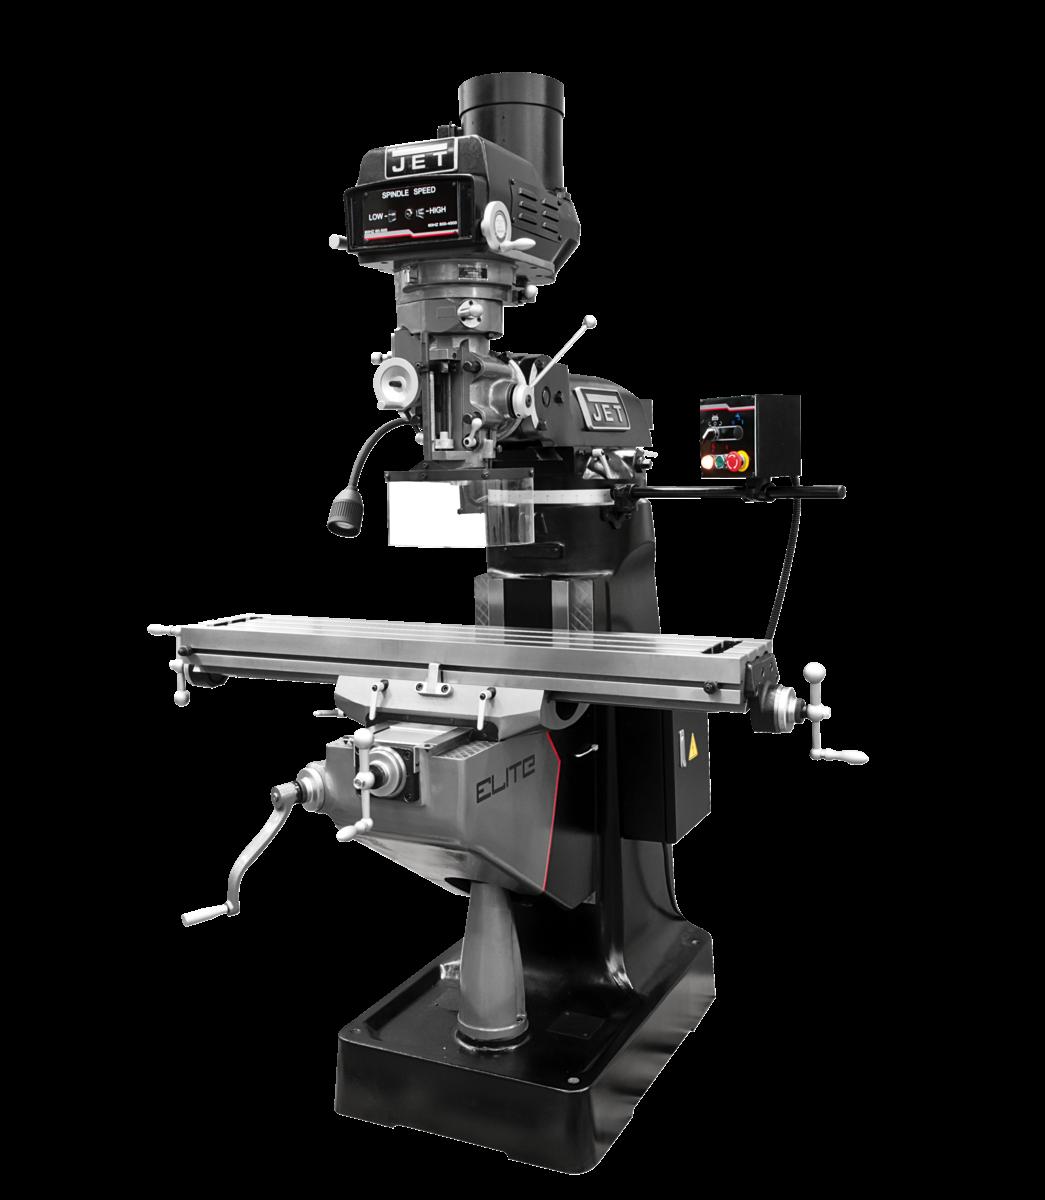 ETM-949- 3X DP700 (K) & X PWRFD